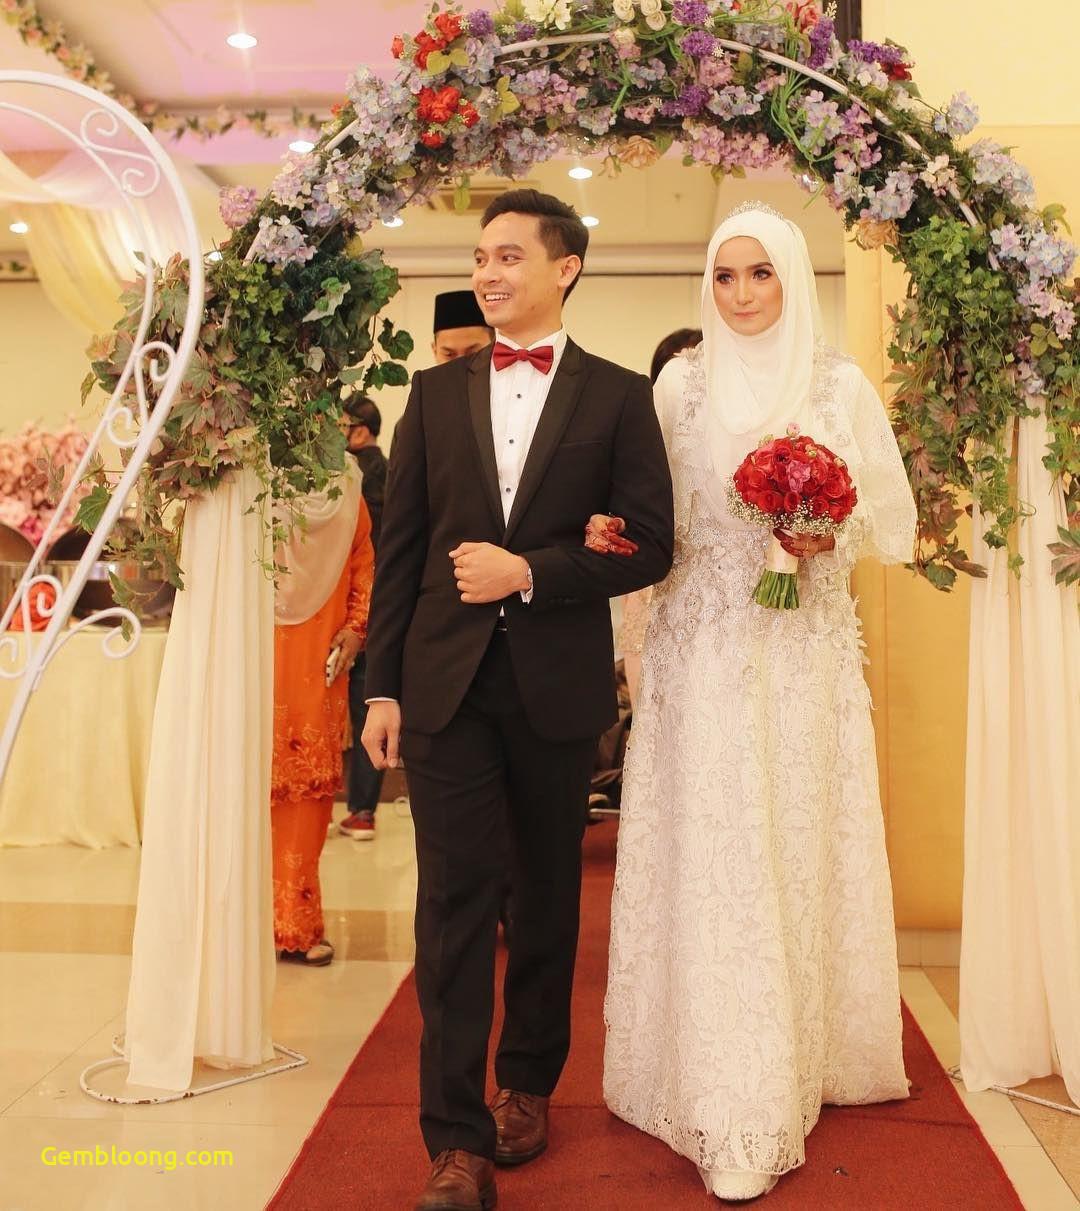 Gaun Pengantin Hijab Minimalis Beautiful 12 Desain Gaun Pernikahan Muslimah Elegan Nan Sederhana